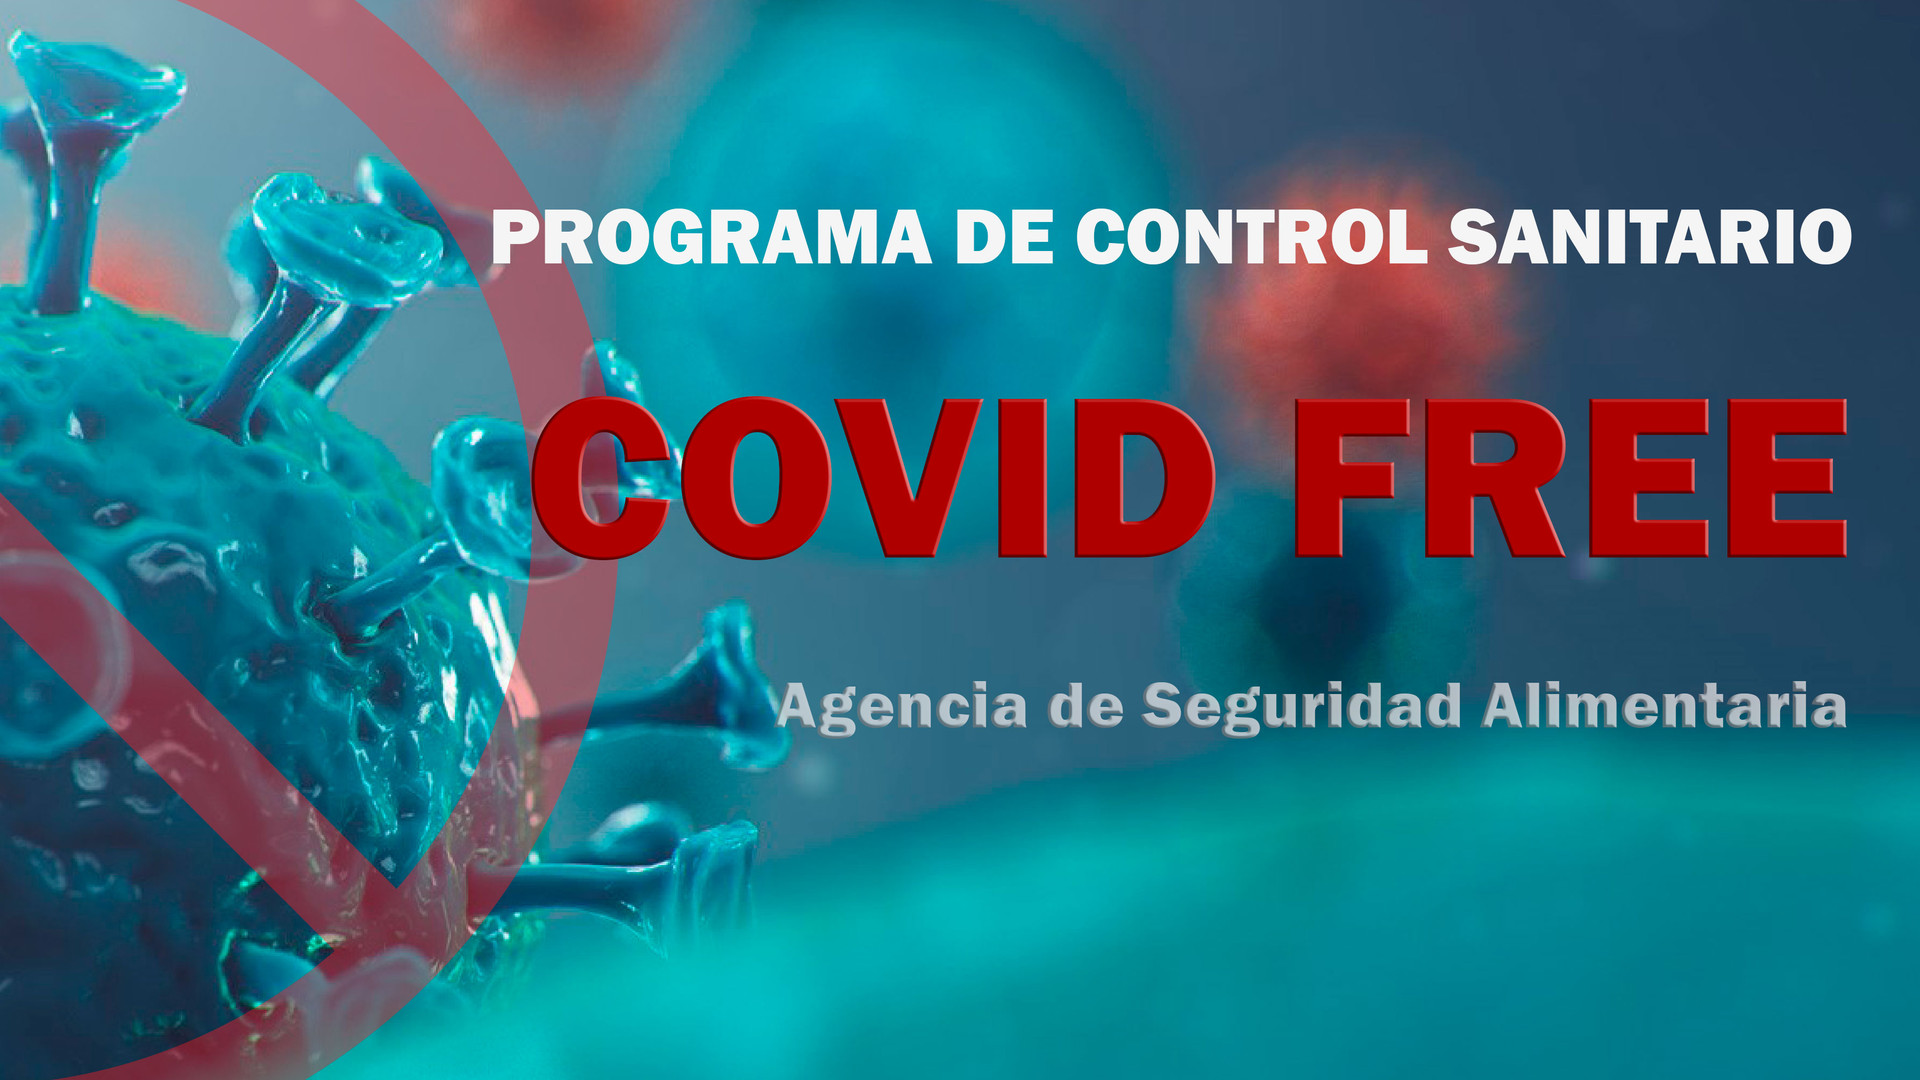 COVID-FREE169.jpg